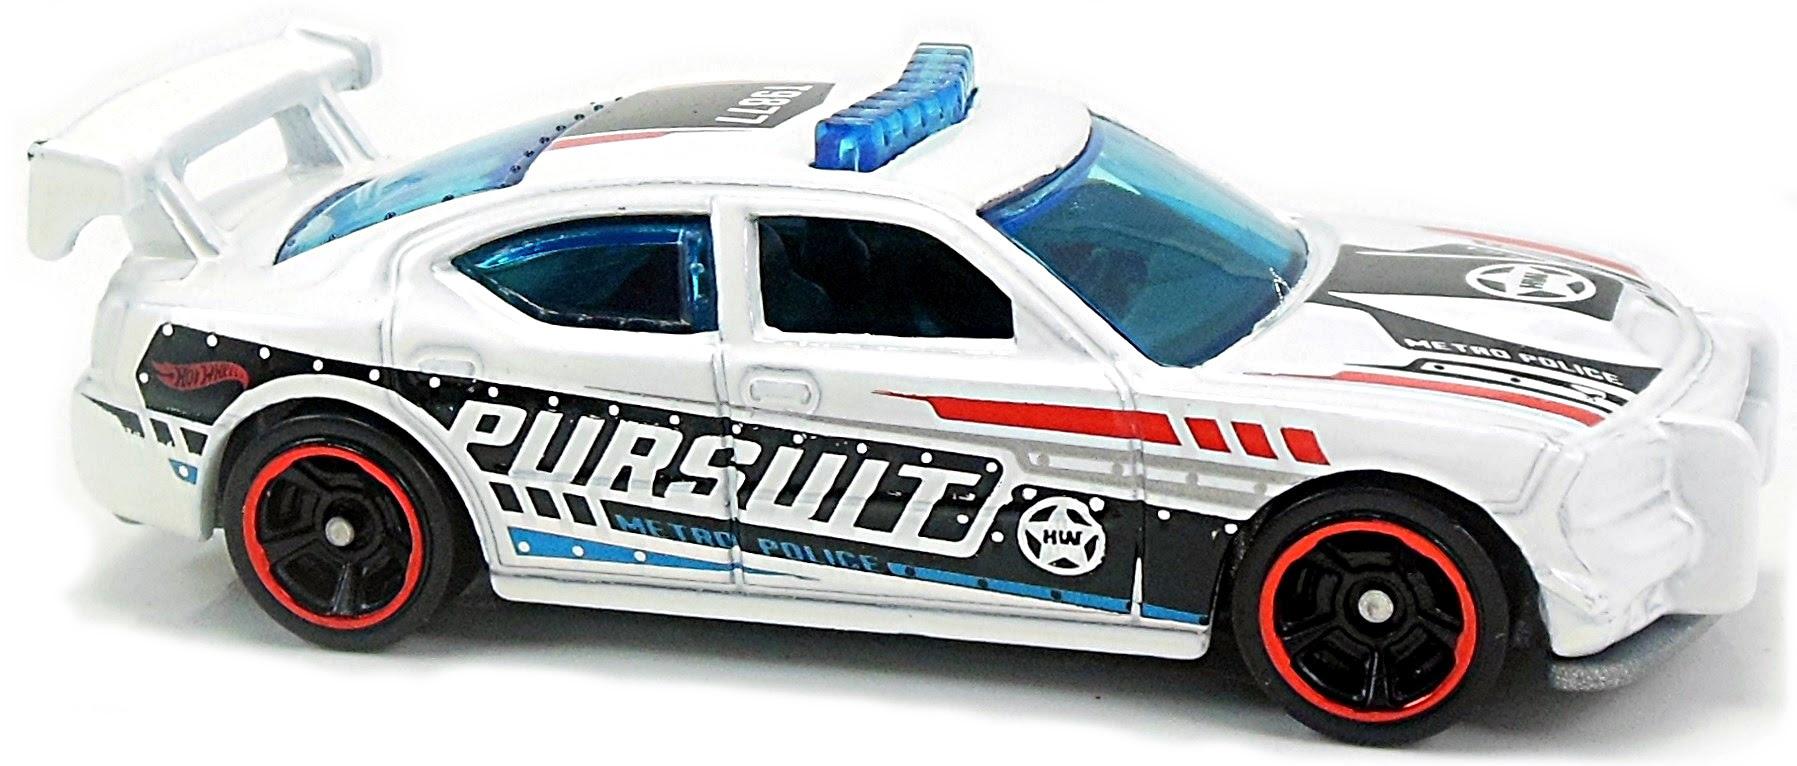 208//365 White Mattel Police Car Hot Wheels 2018 50th Anniversary HW Metro Series Dodge Charger Drift